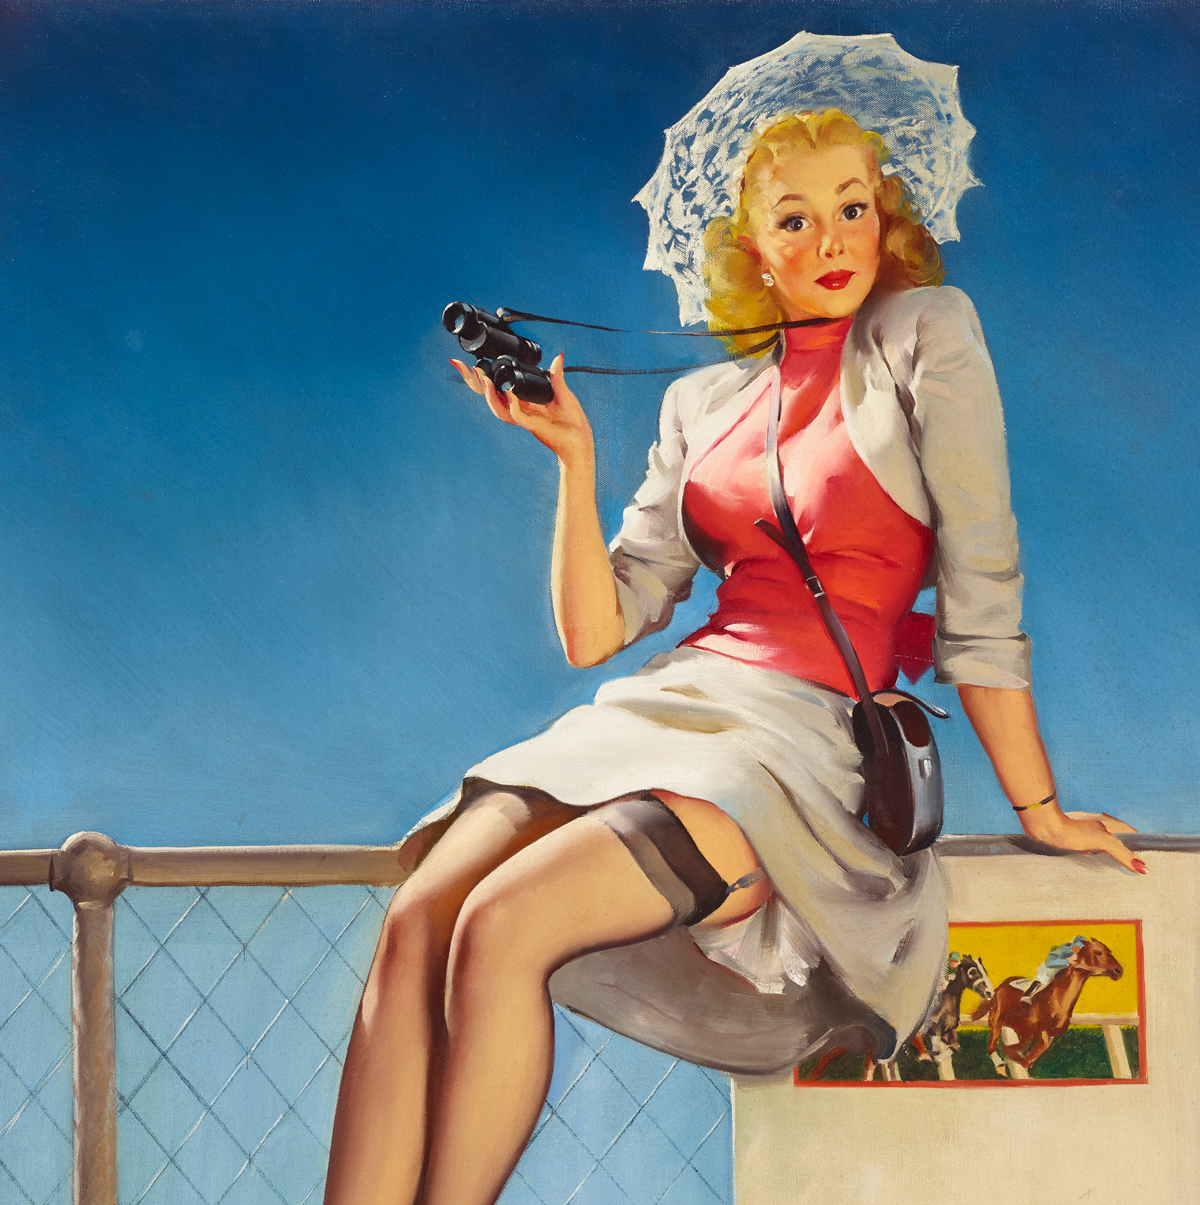 2019 Vintage Pinup Girl Gil Elvgren Hand Painted Art Oil: Gil Elvgren